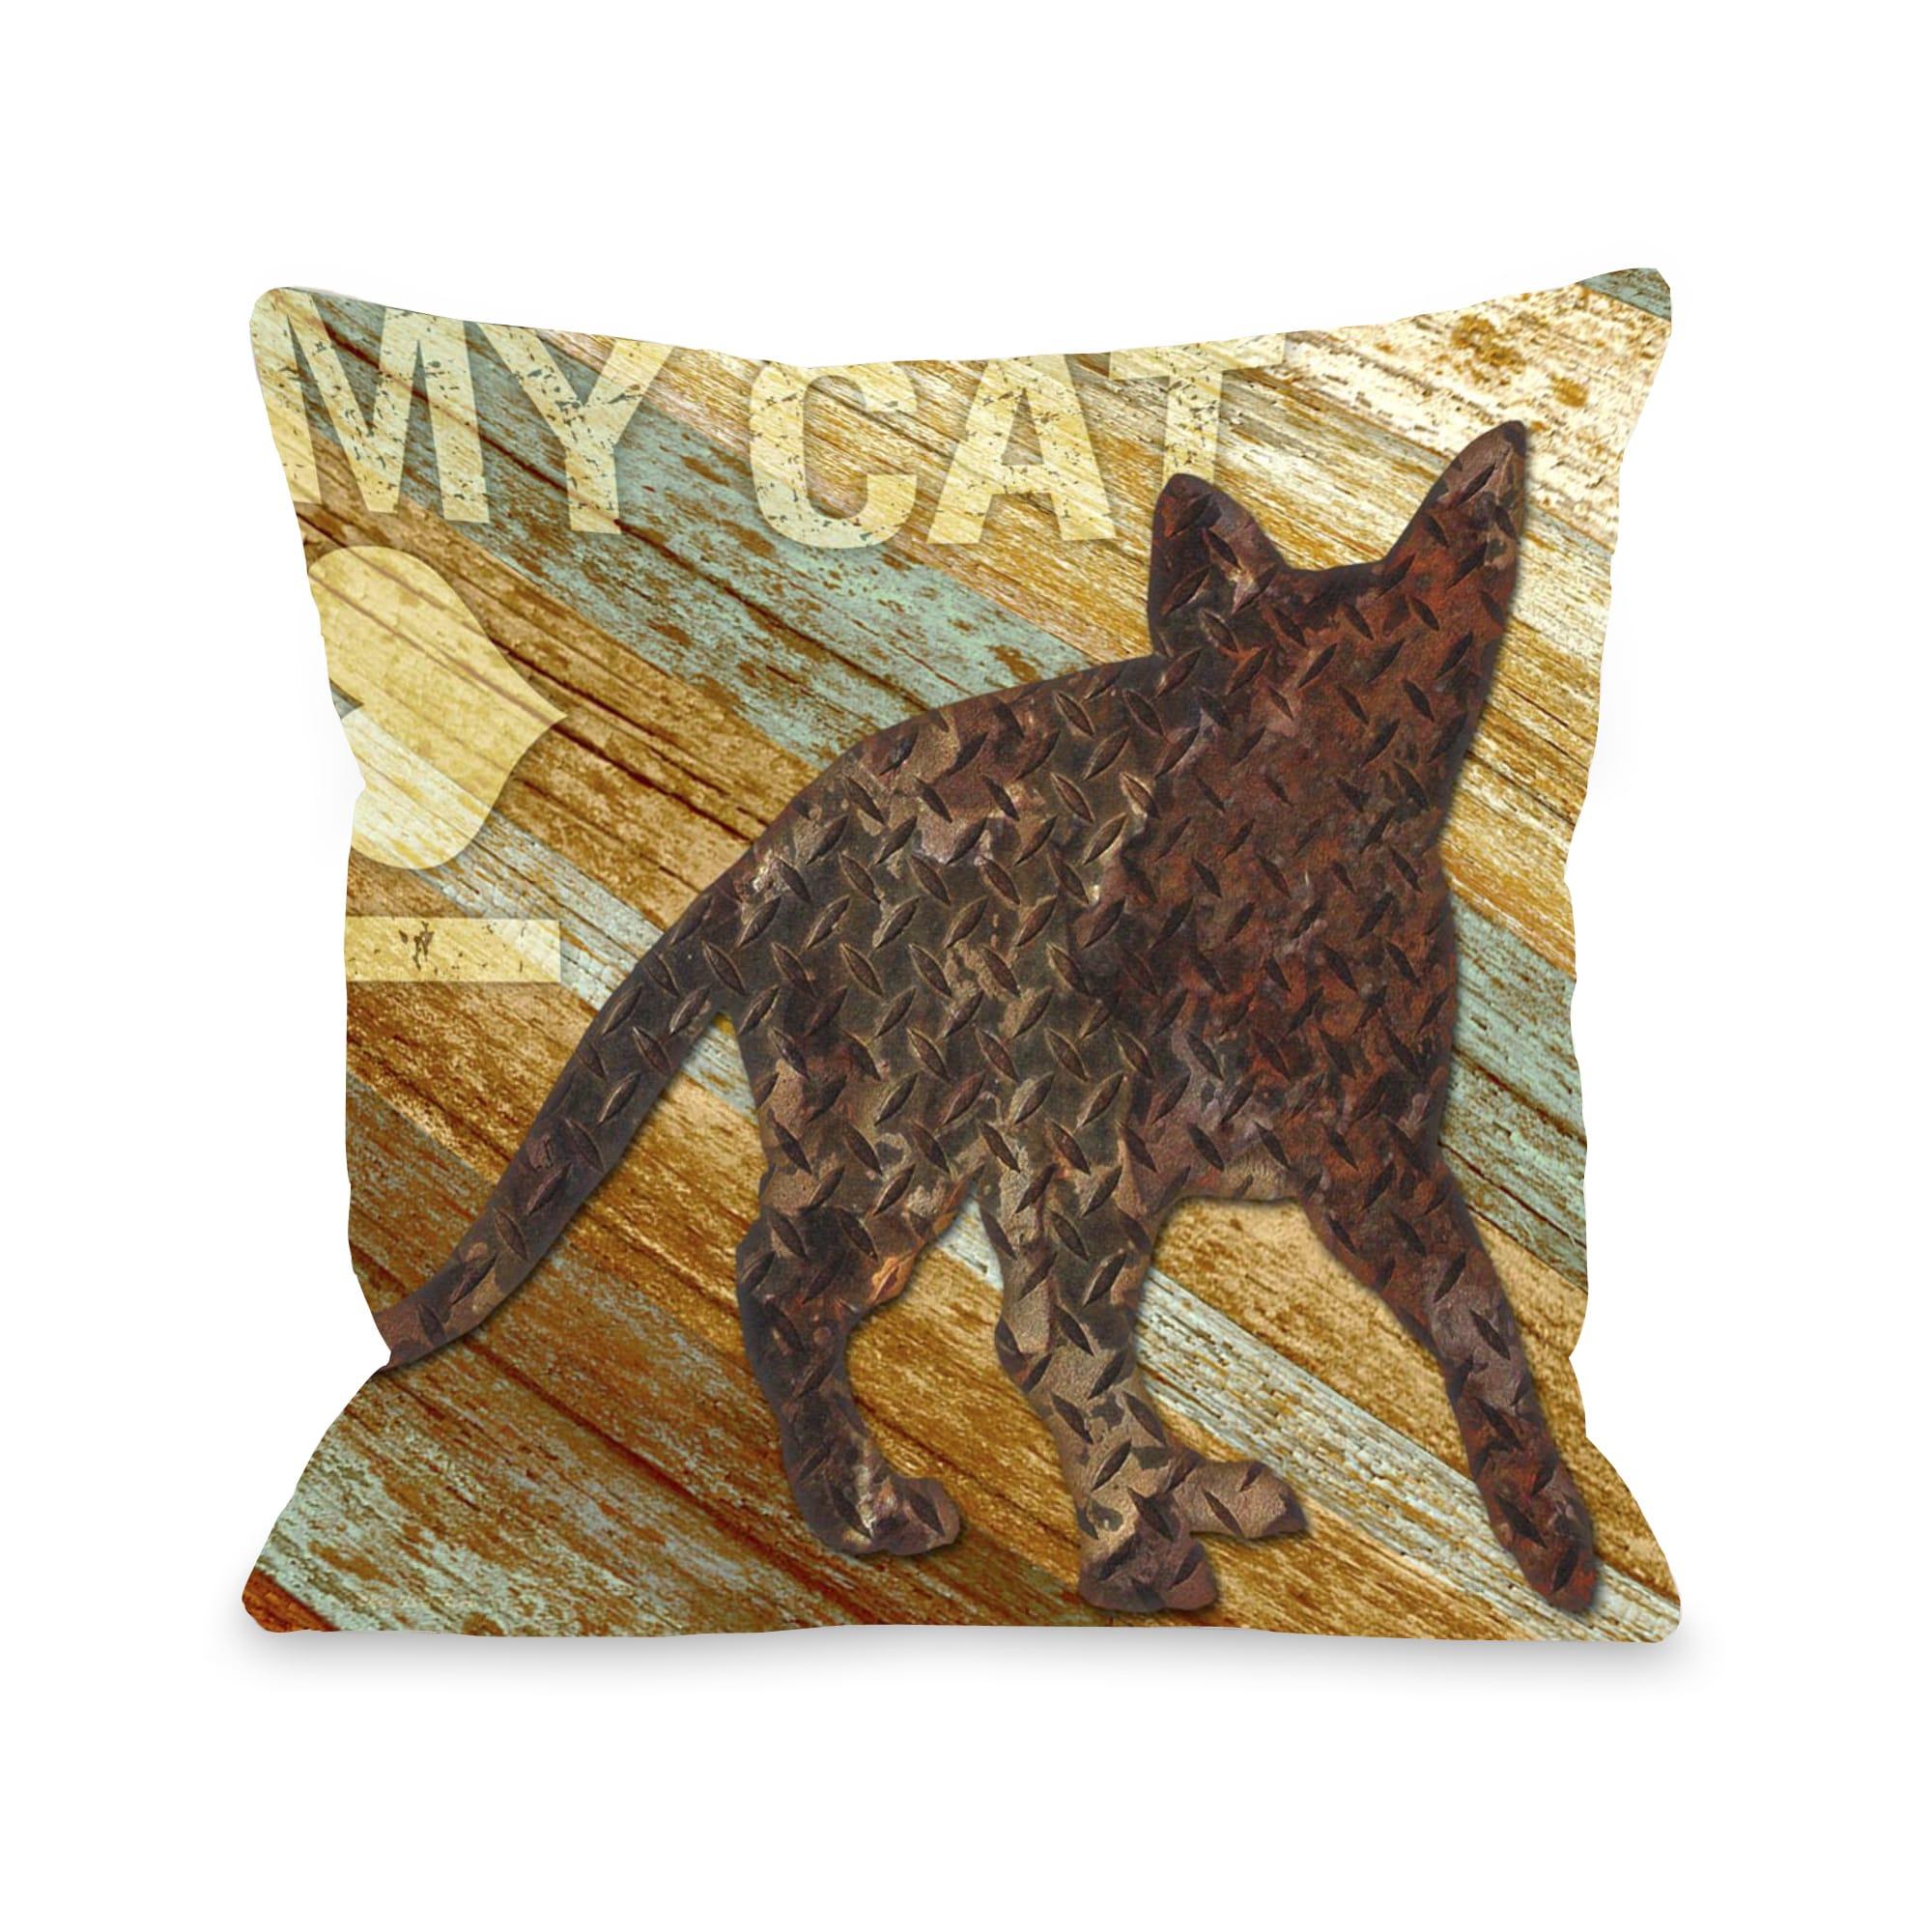 I love my Cat Wood Throw Pillow (Medium - 16 x 16)